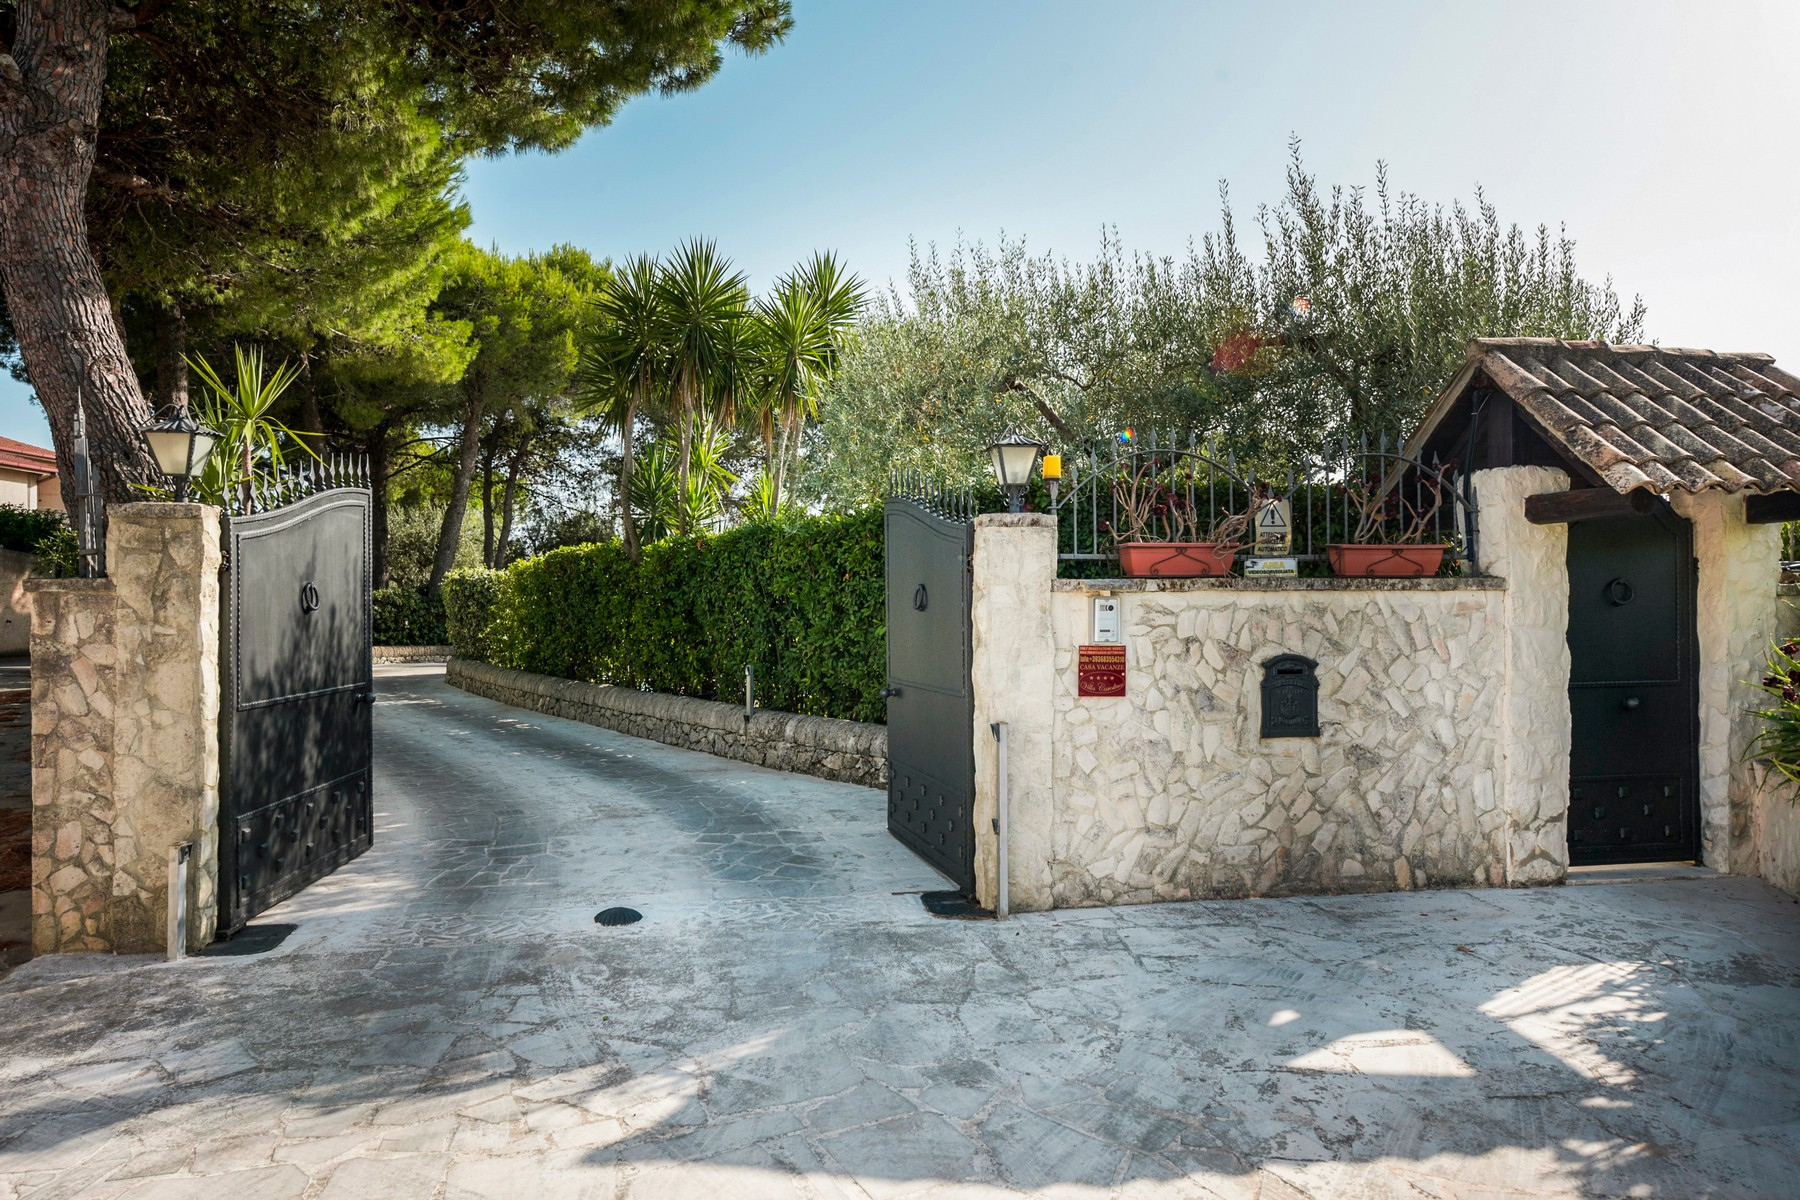 Casa indipendente in Vendita a Noto: 5 locali, 300 mq - Foto 8